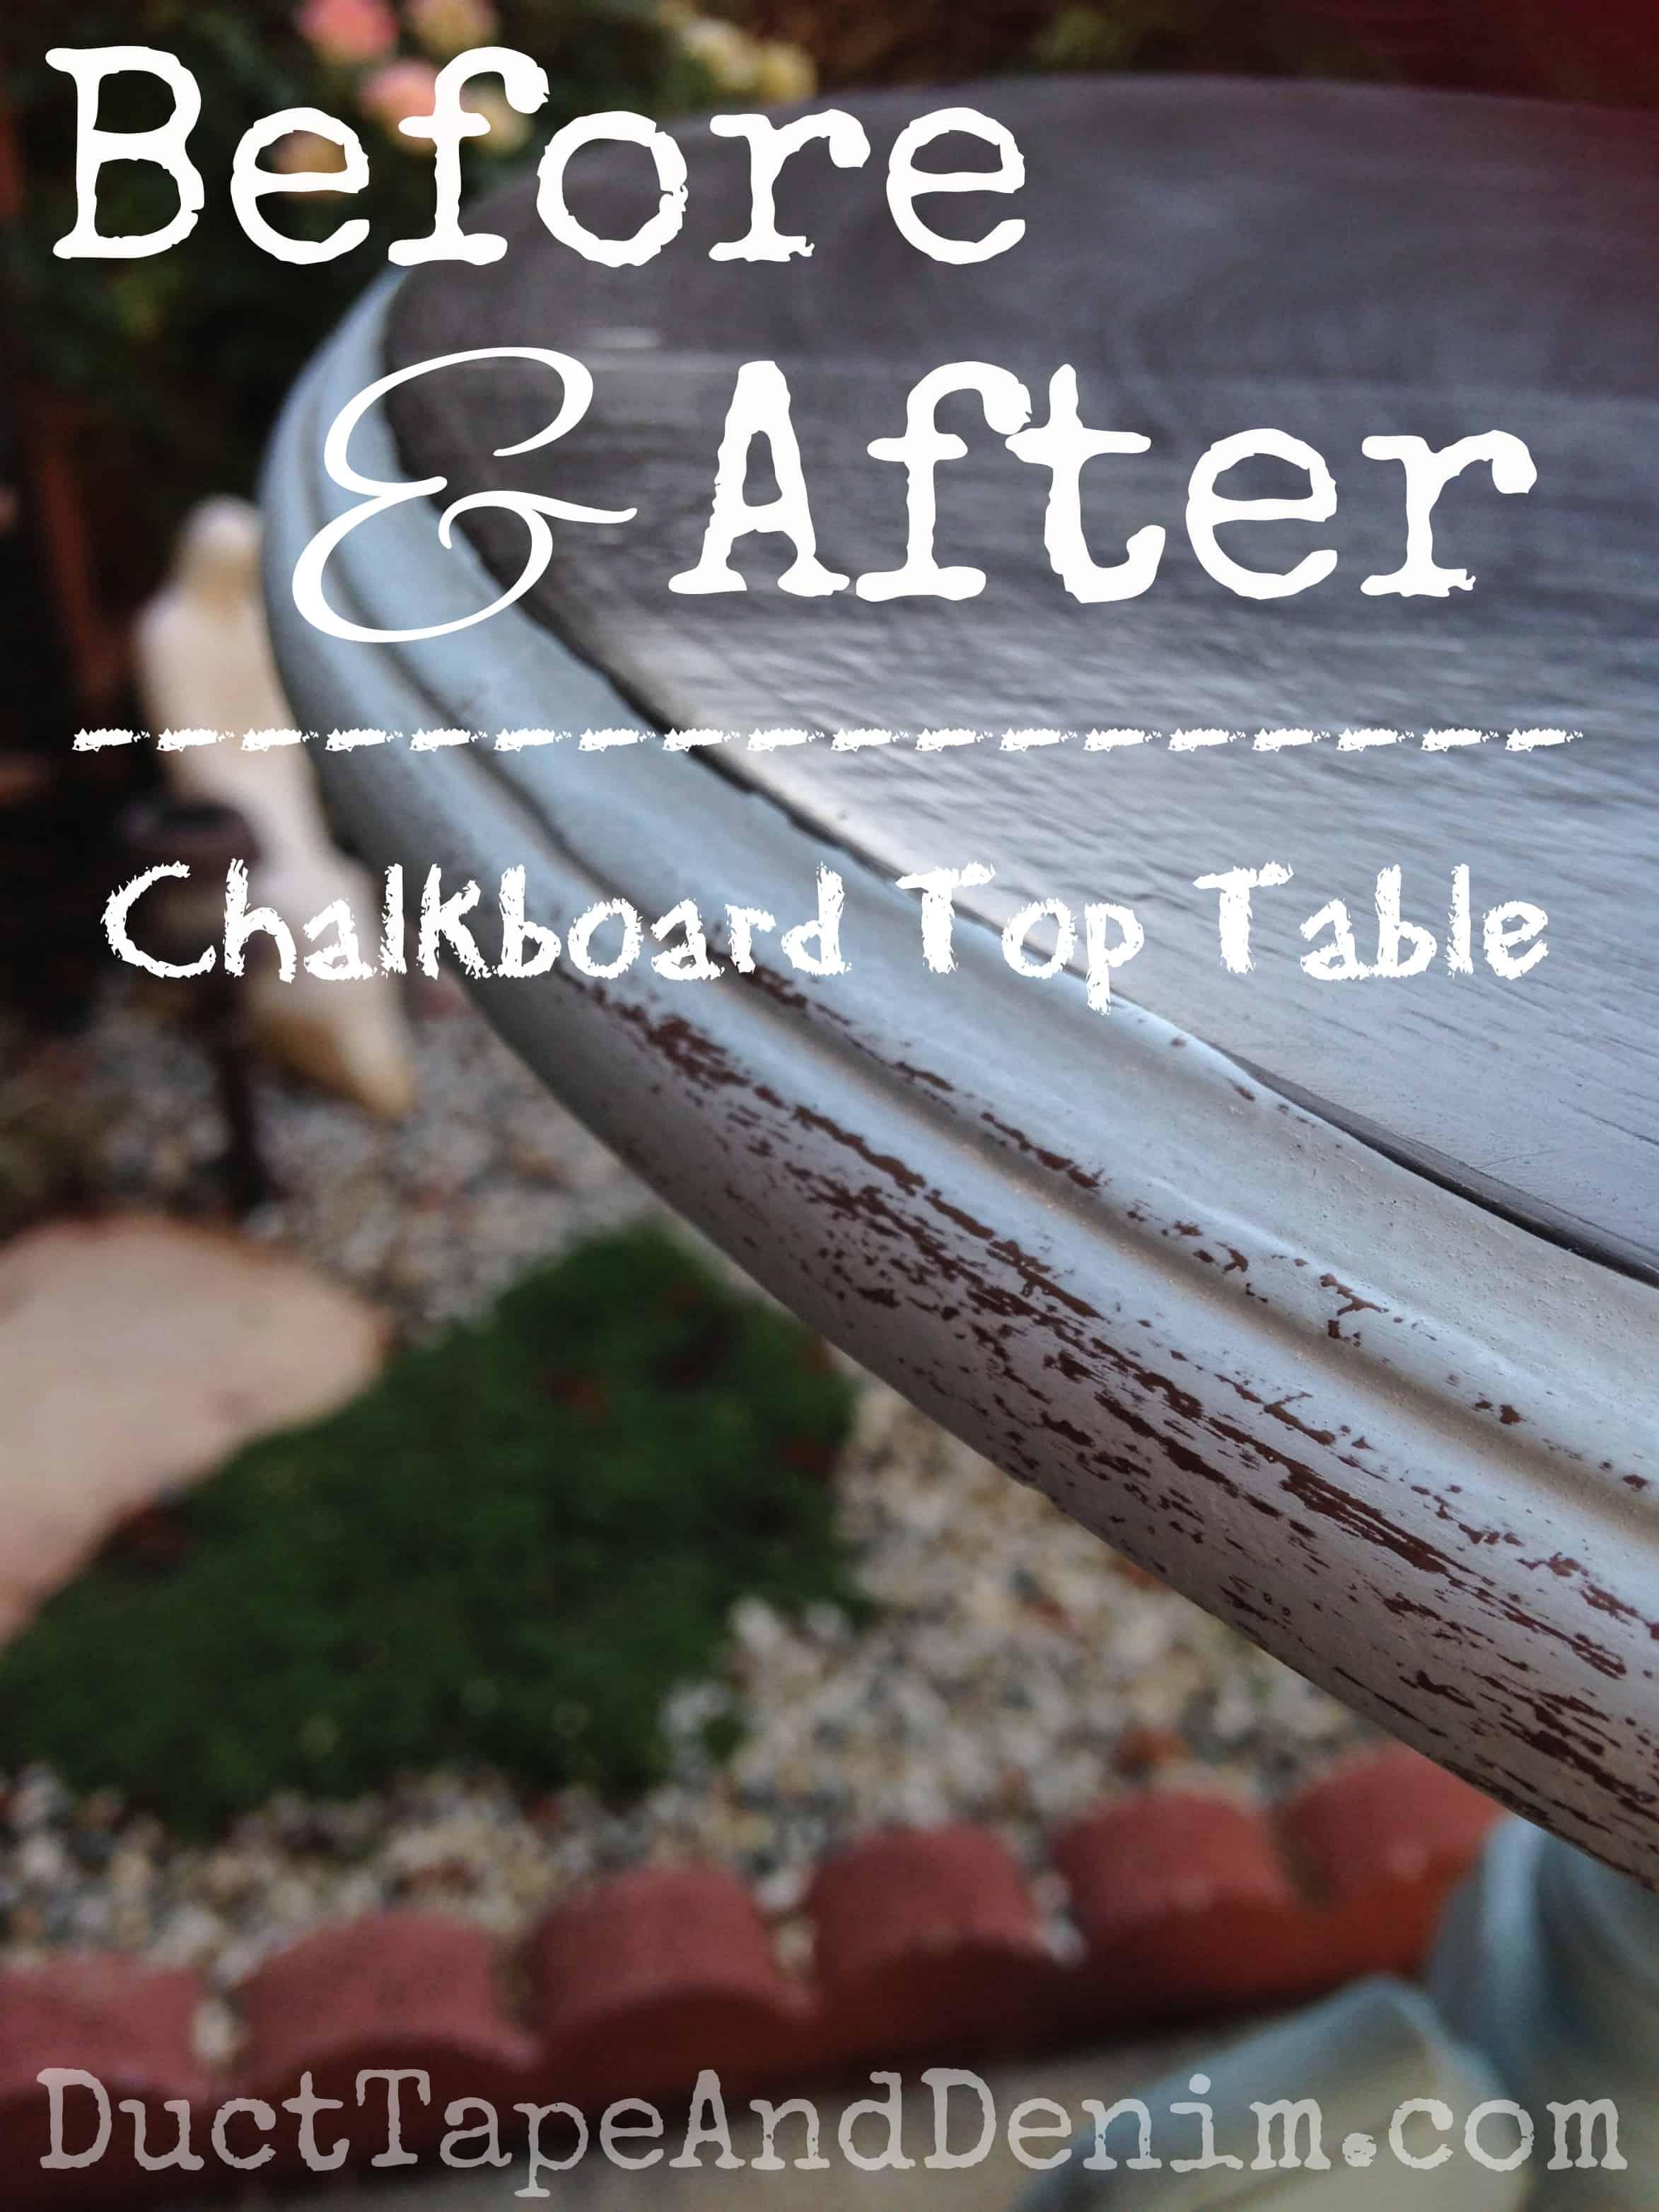 CeCe Caldwell's Memphis Blue Chalkboard Table